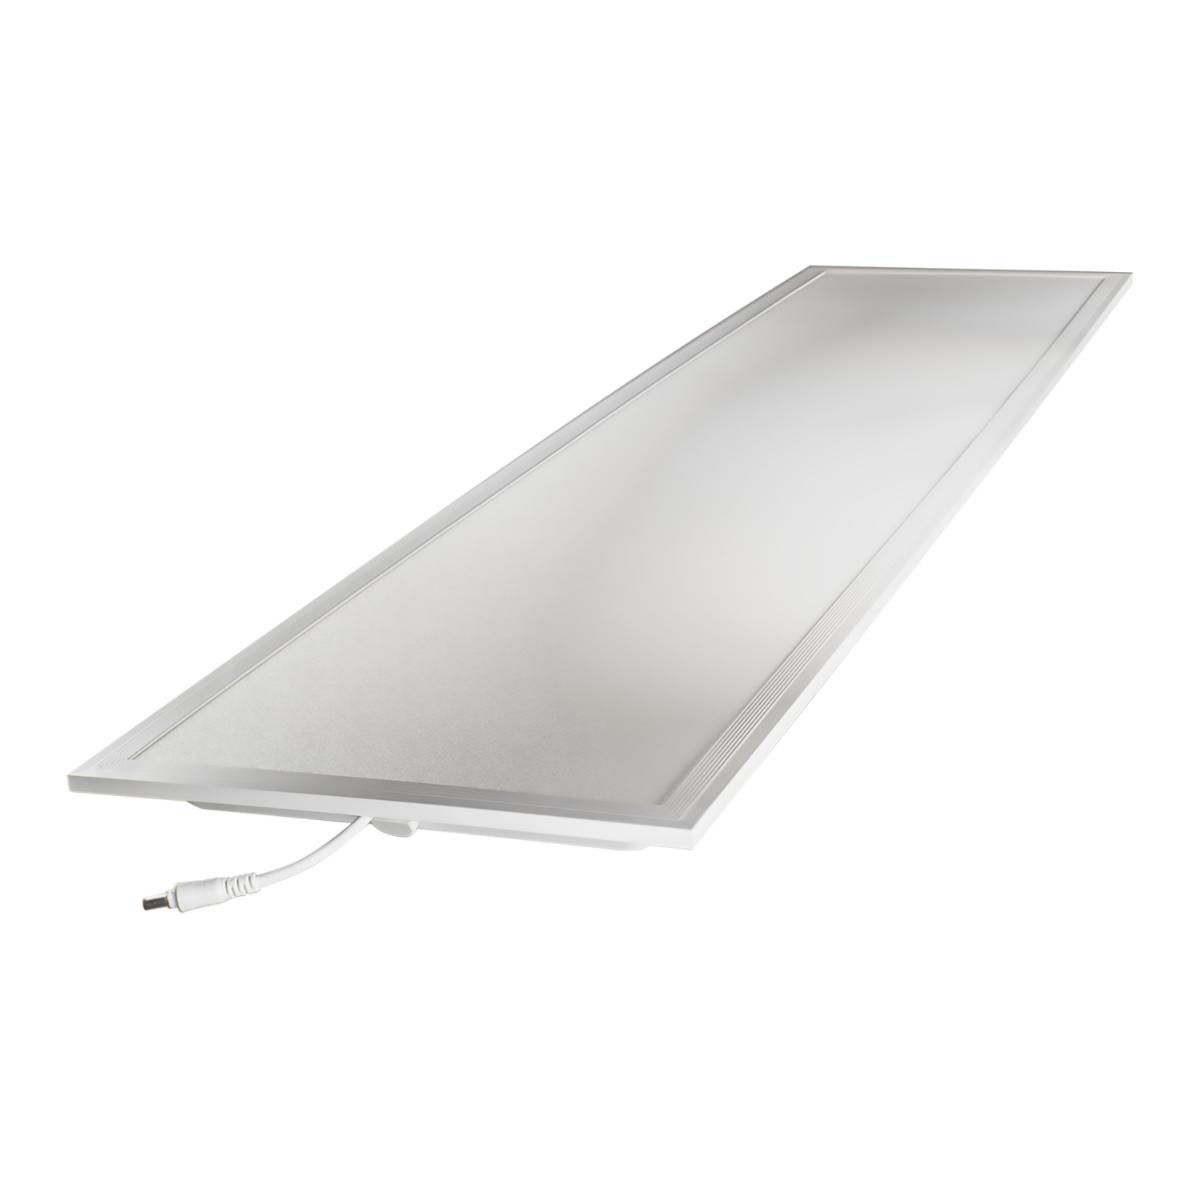 Noxion LED Paneeli Delta Pro V2.0 Xitanium DALI 30W 30x120cm 3000K 3960lm UGR <19 | Dali Himmennettävä - Lämmin Valkoinen - Korvaa 2x36W